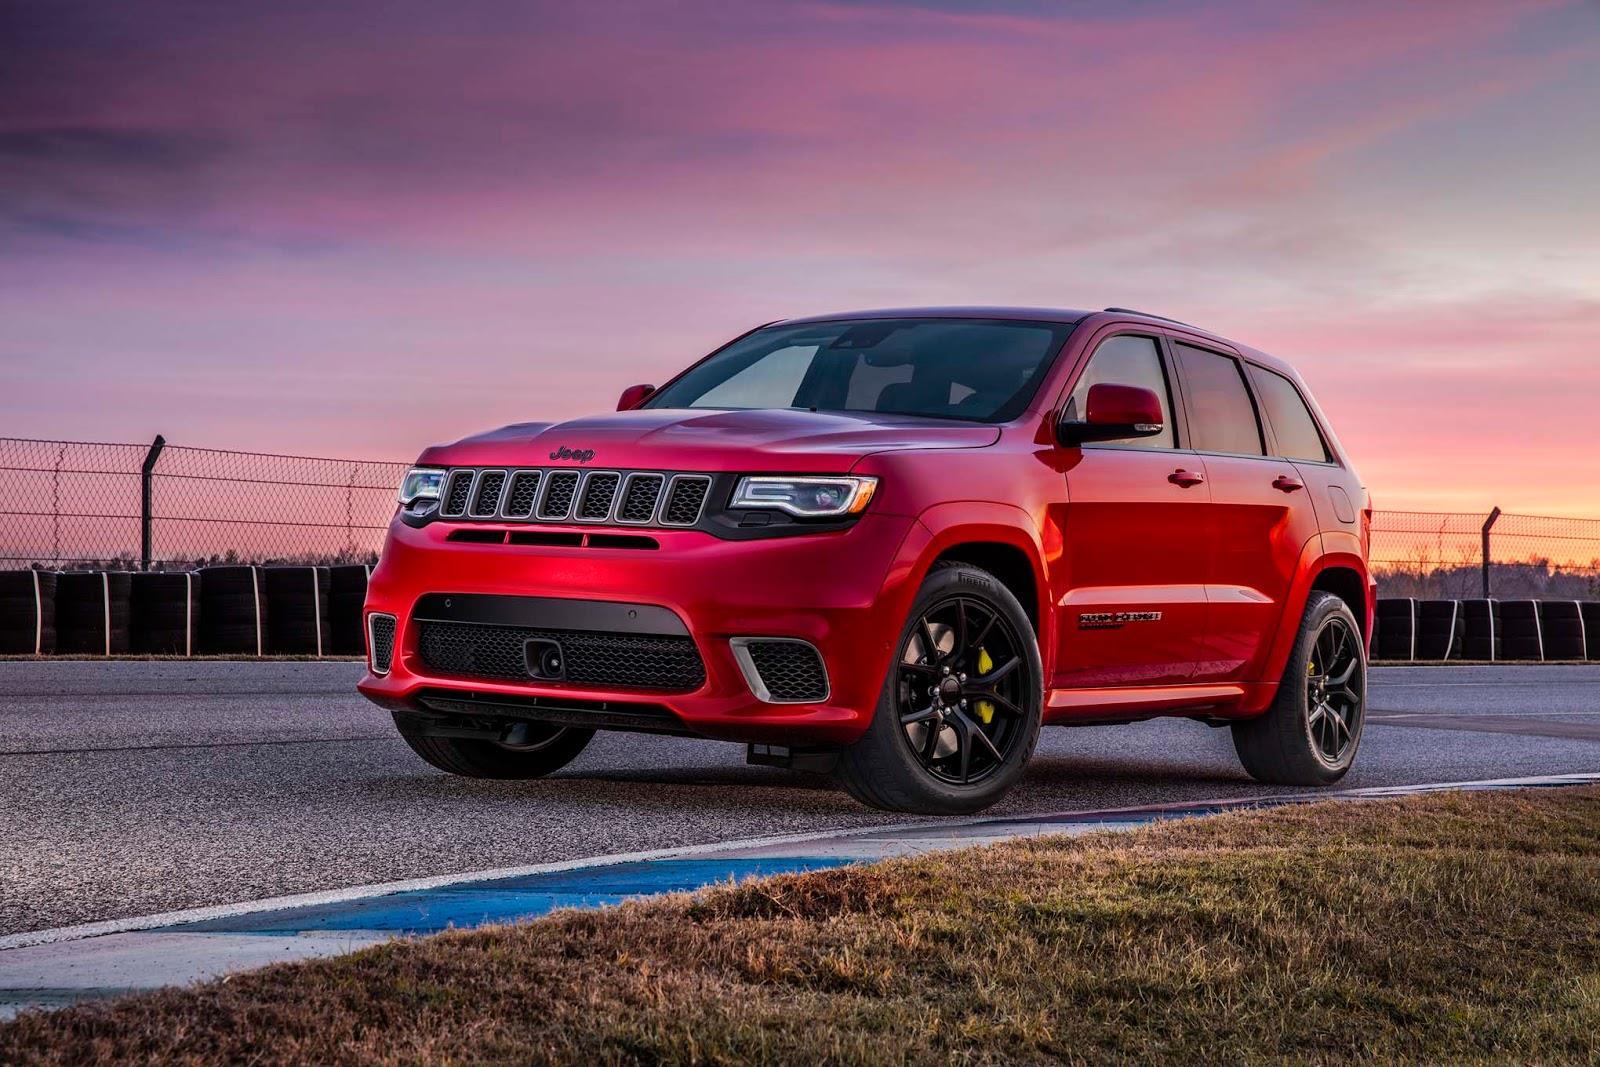 717hp Jeep Grand Cherokee Trackhawk revealed